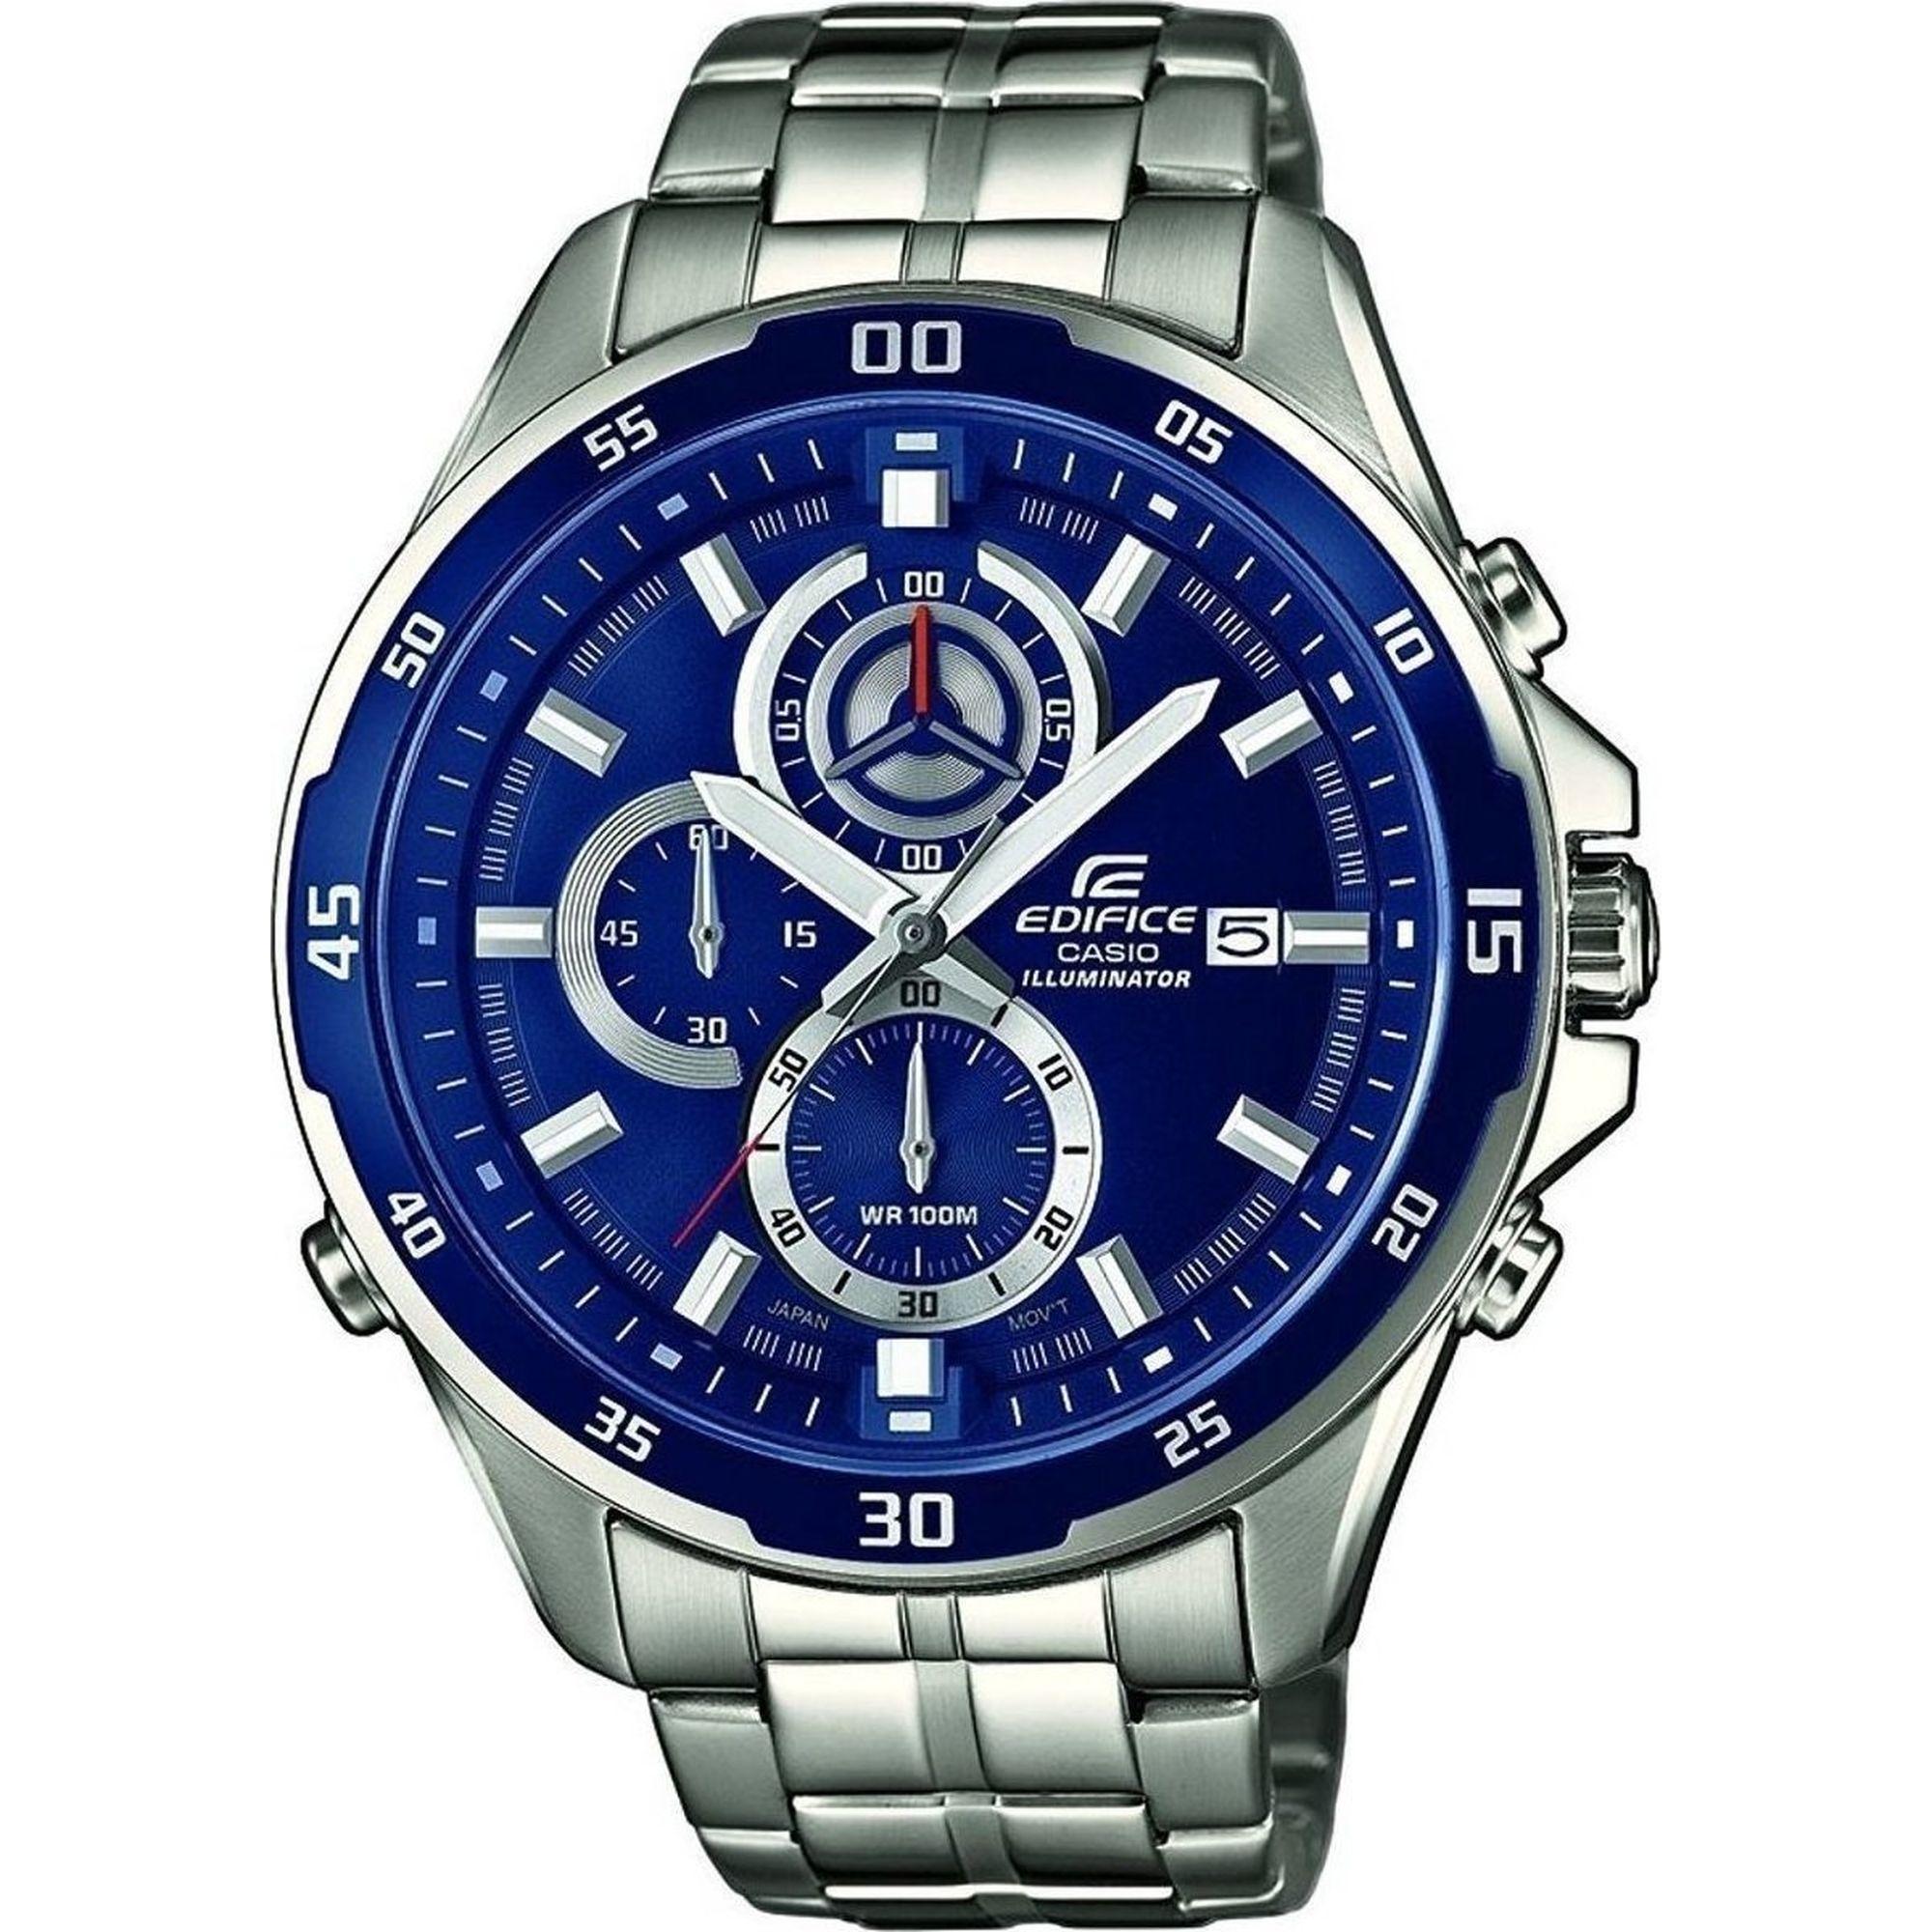 Casio Edifice 47mm Μπλέ/Ασημί Μπρασελέ Casio EFR-547D-2AVUEF, ρολόι, ανδρικό ρολόι, Casio, Casio ρολόι, δωρεάν μεταφορικά, άμεση διαθεσιμότητα